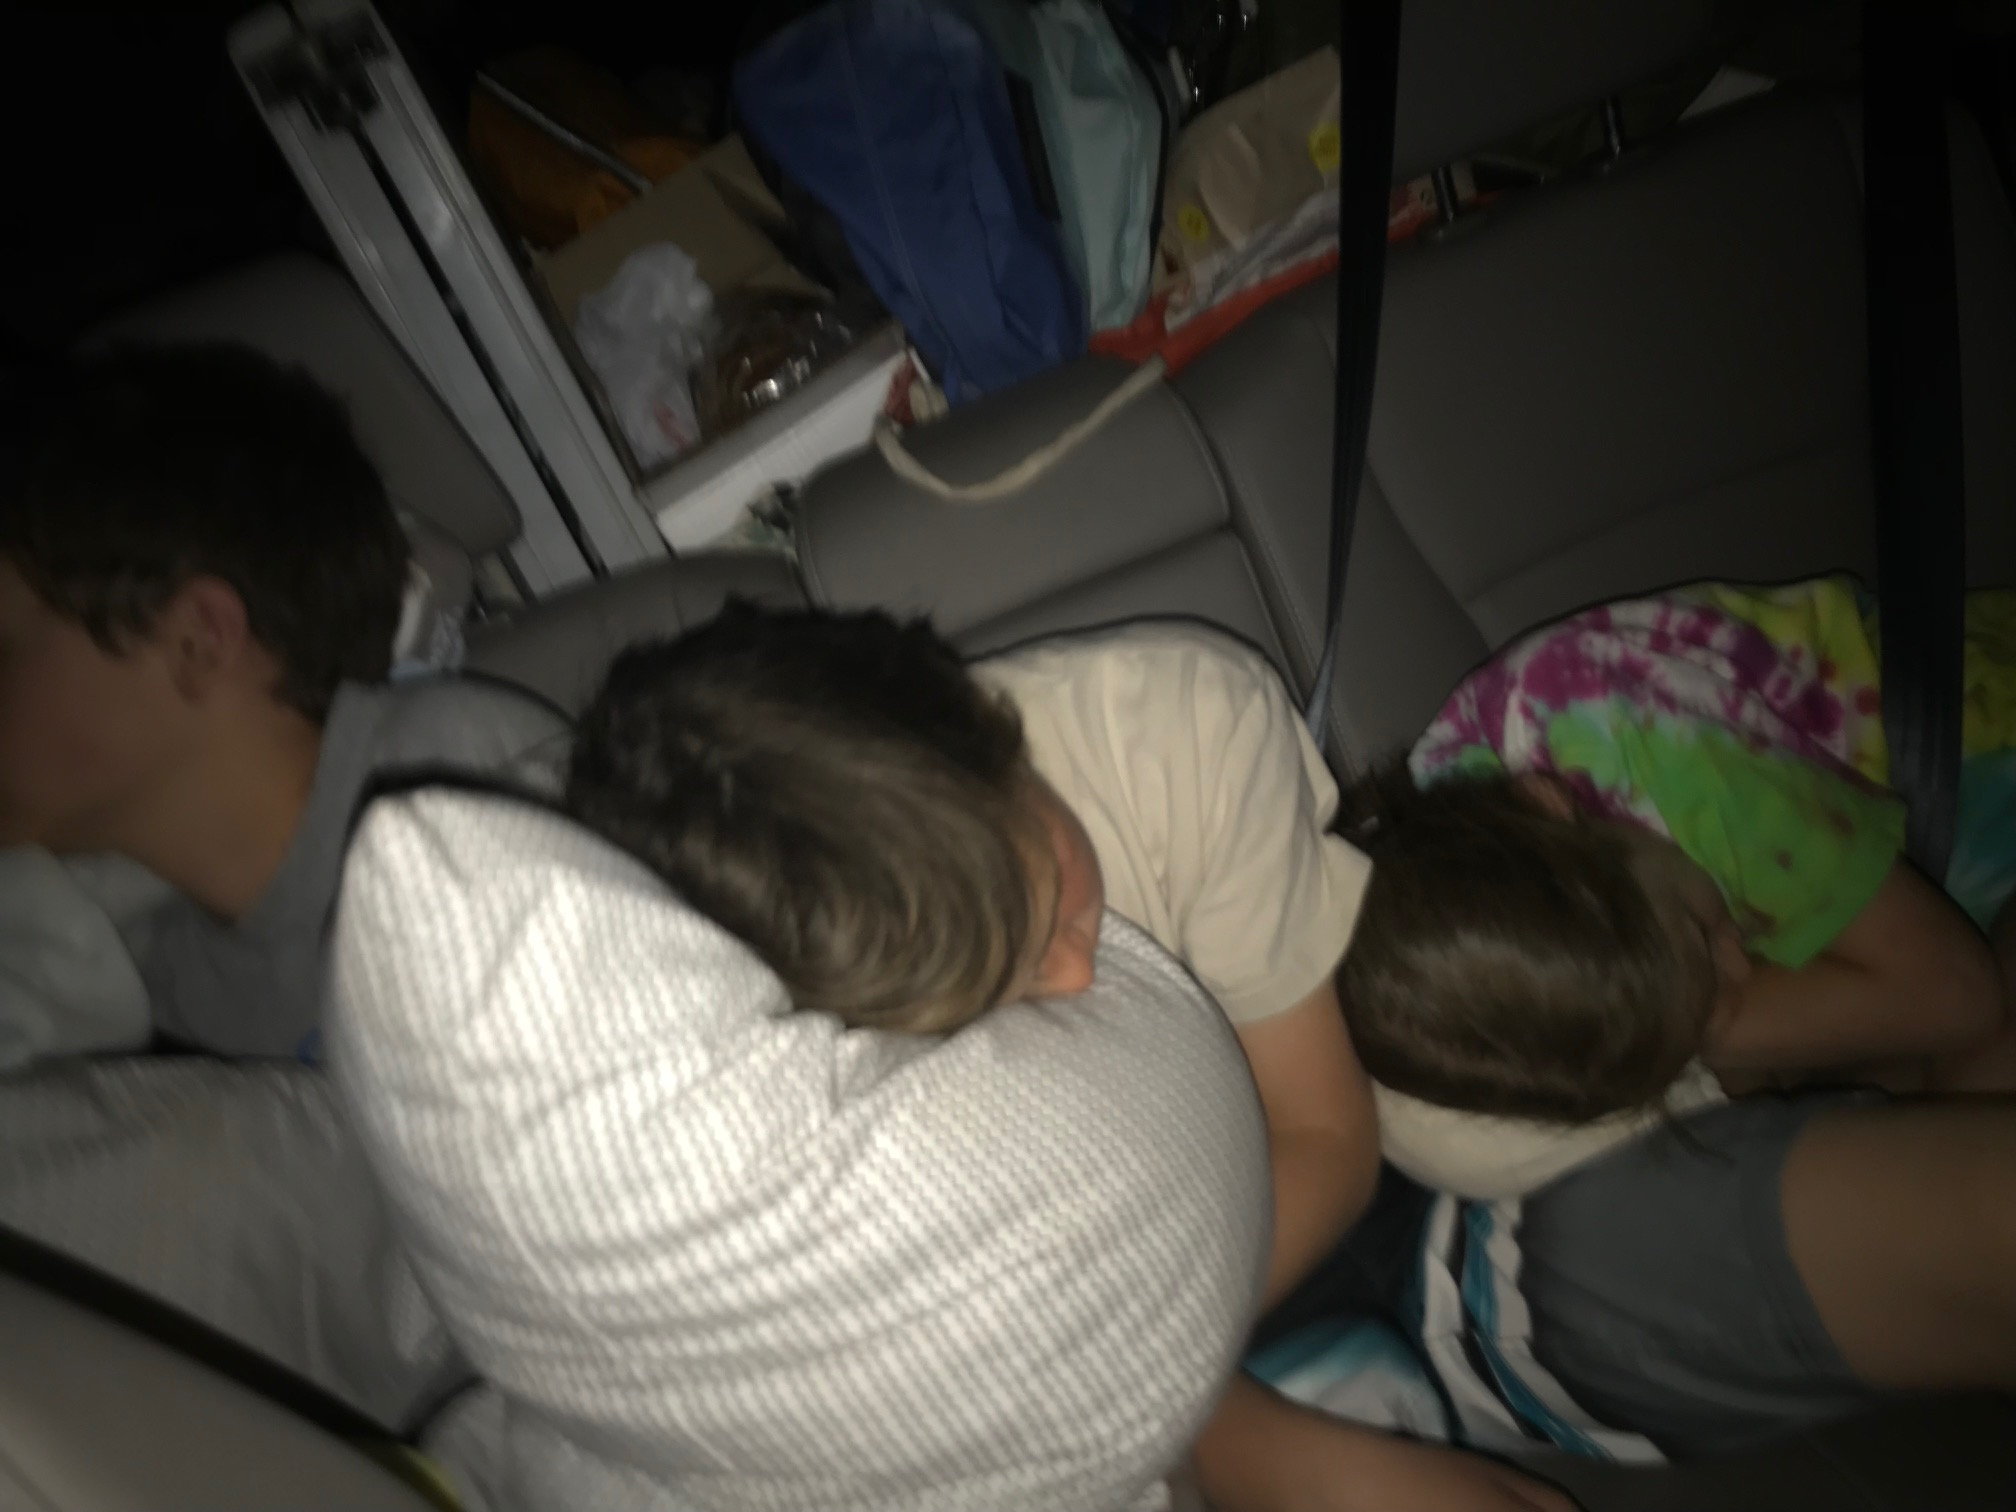 Kids Sleeping on the way BACK TO Sanderson